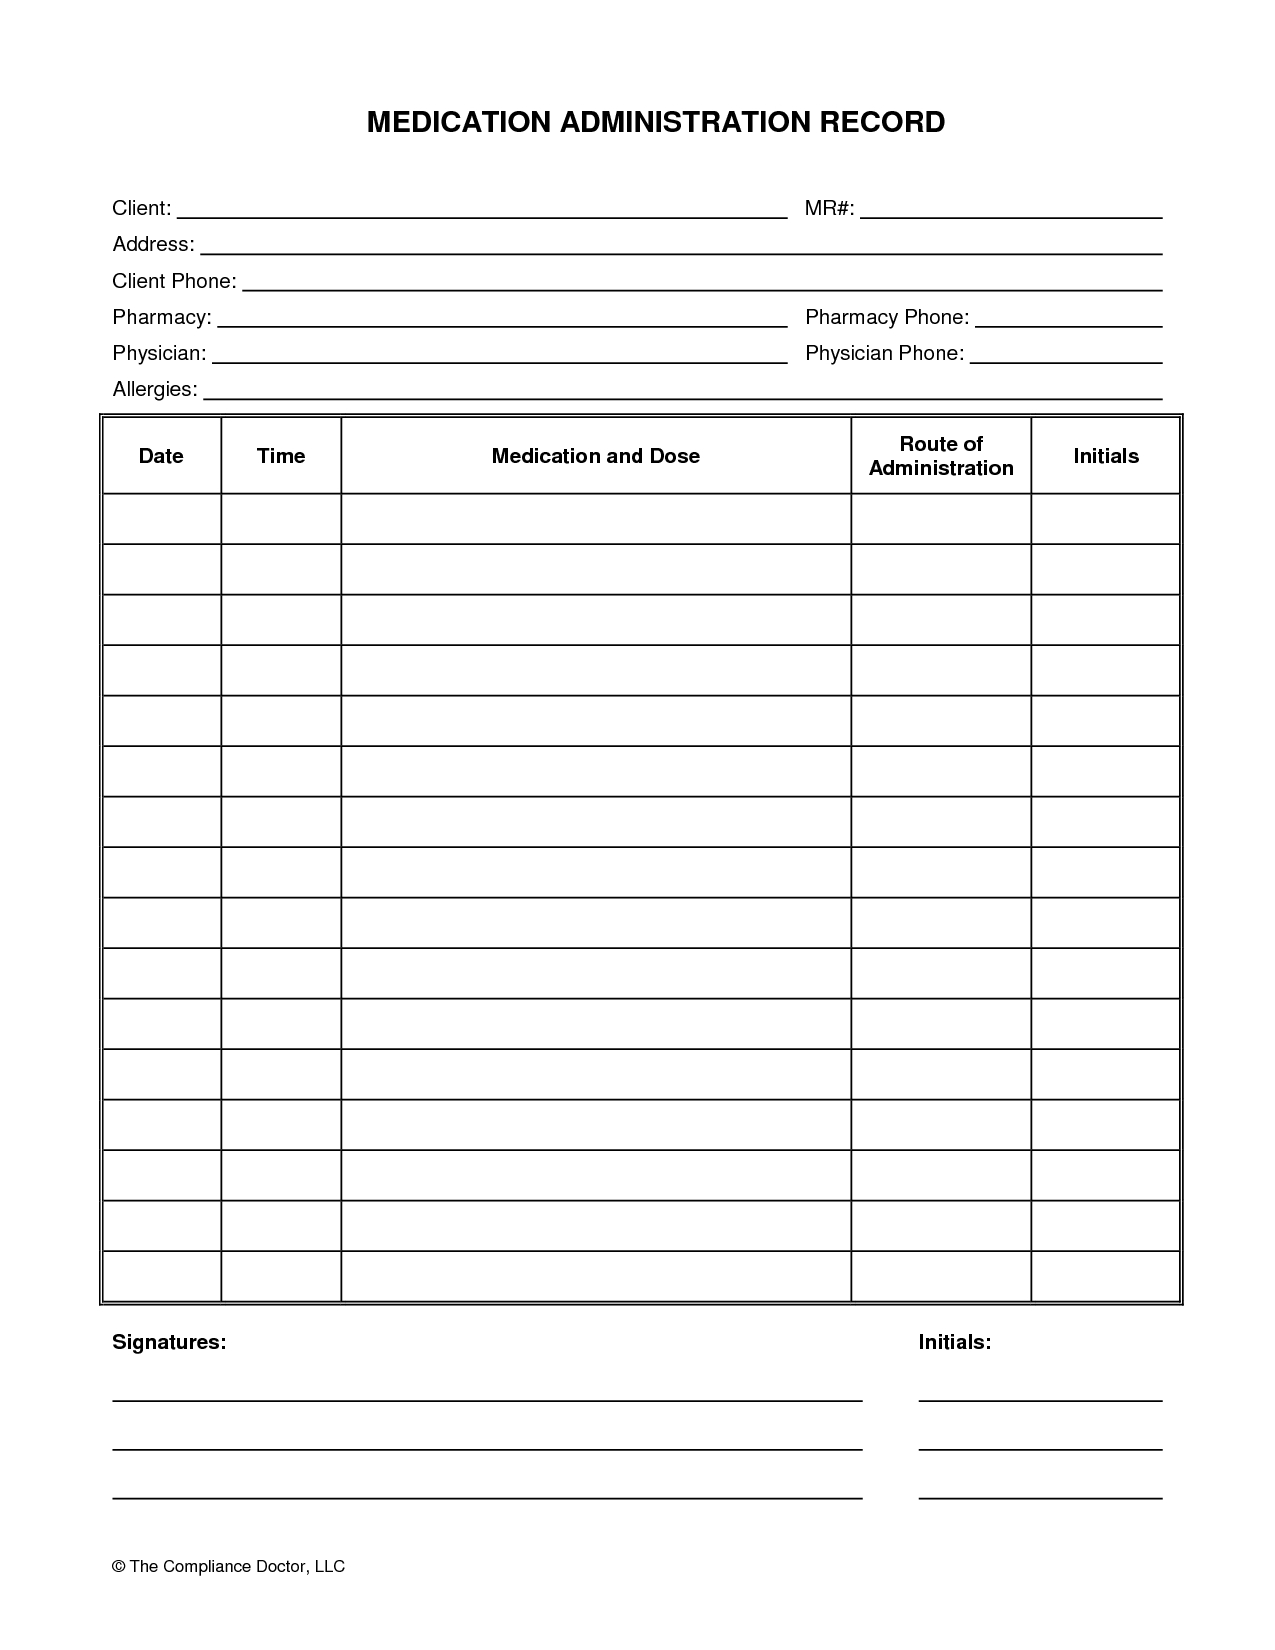 Medication Administration Record Form | Organization | Medication with Printable 30 Day Medication Sheet